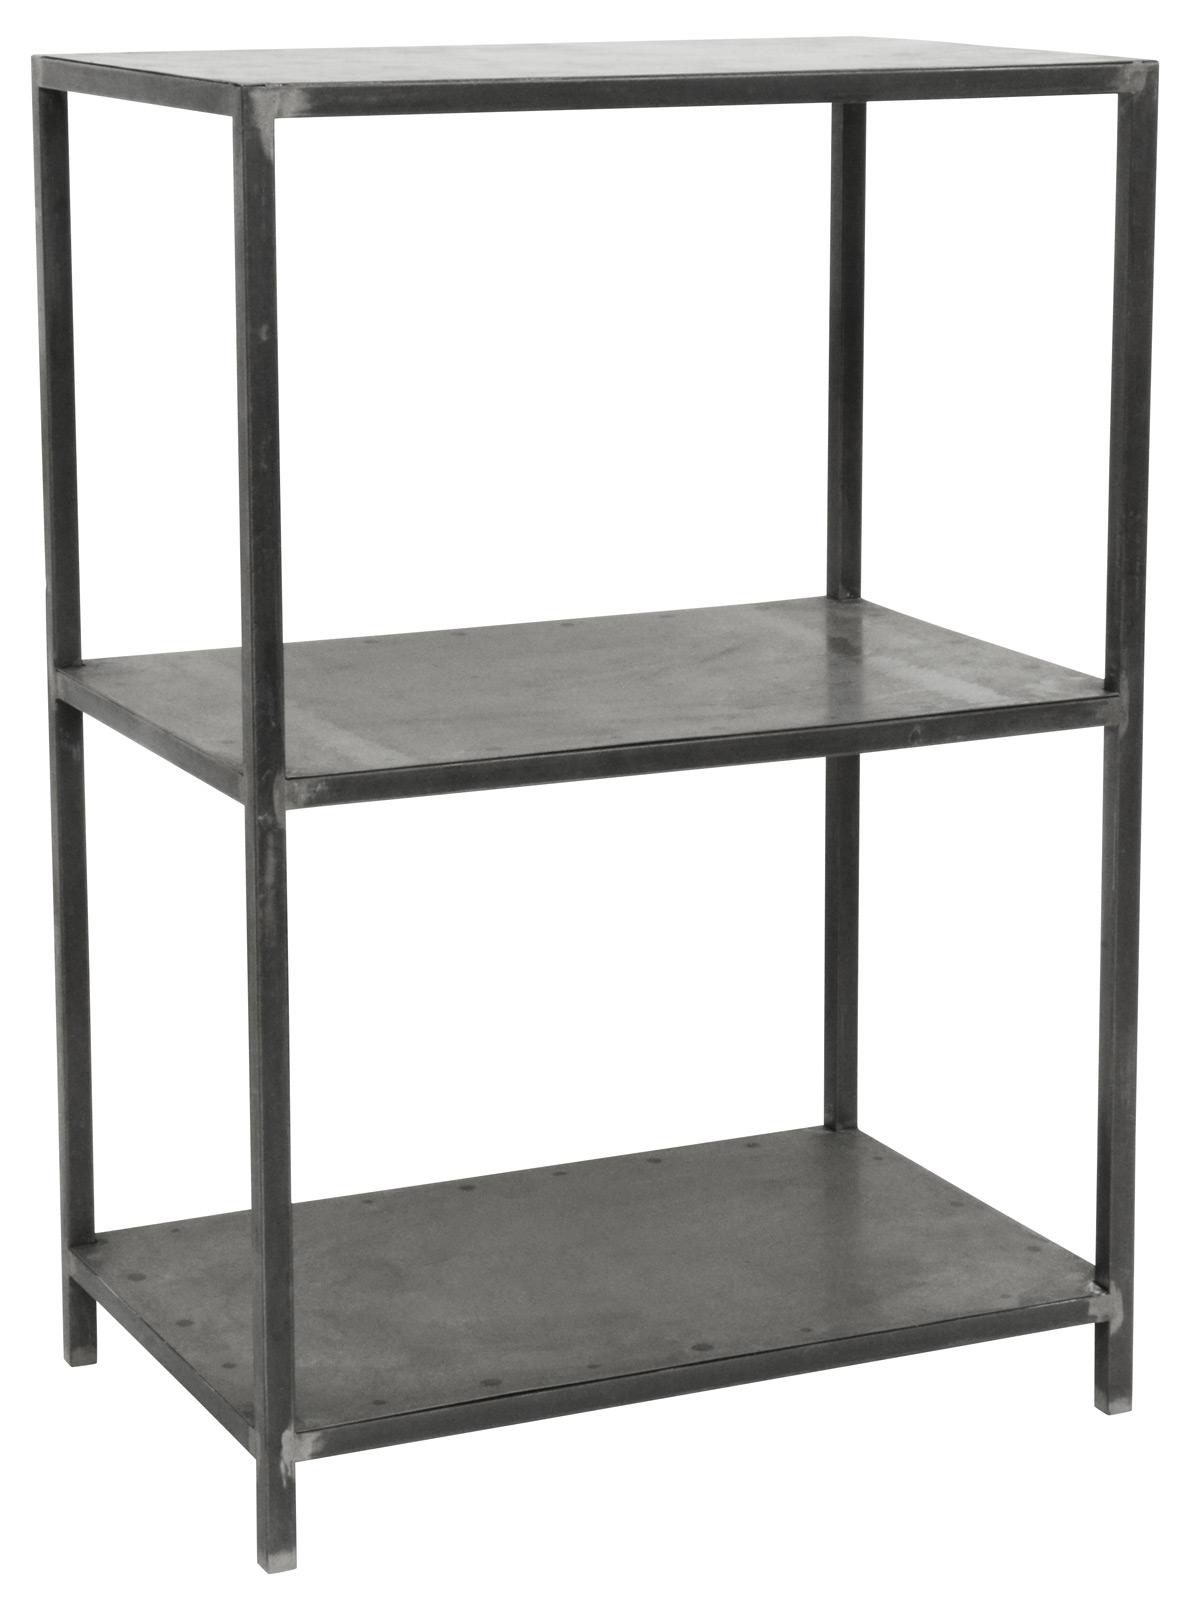 Ib laursen reol - grå metal, factory style, 2 hylder og 2 rum, max 10 kg pr. hylde, (90x40cm)